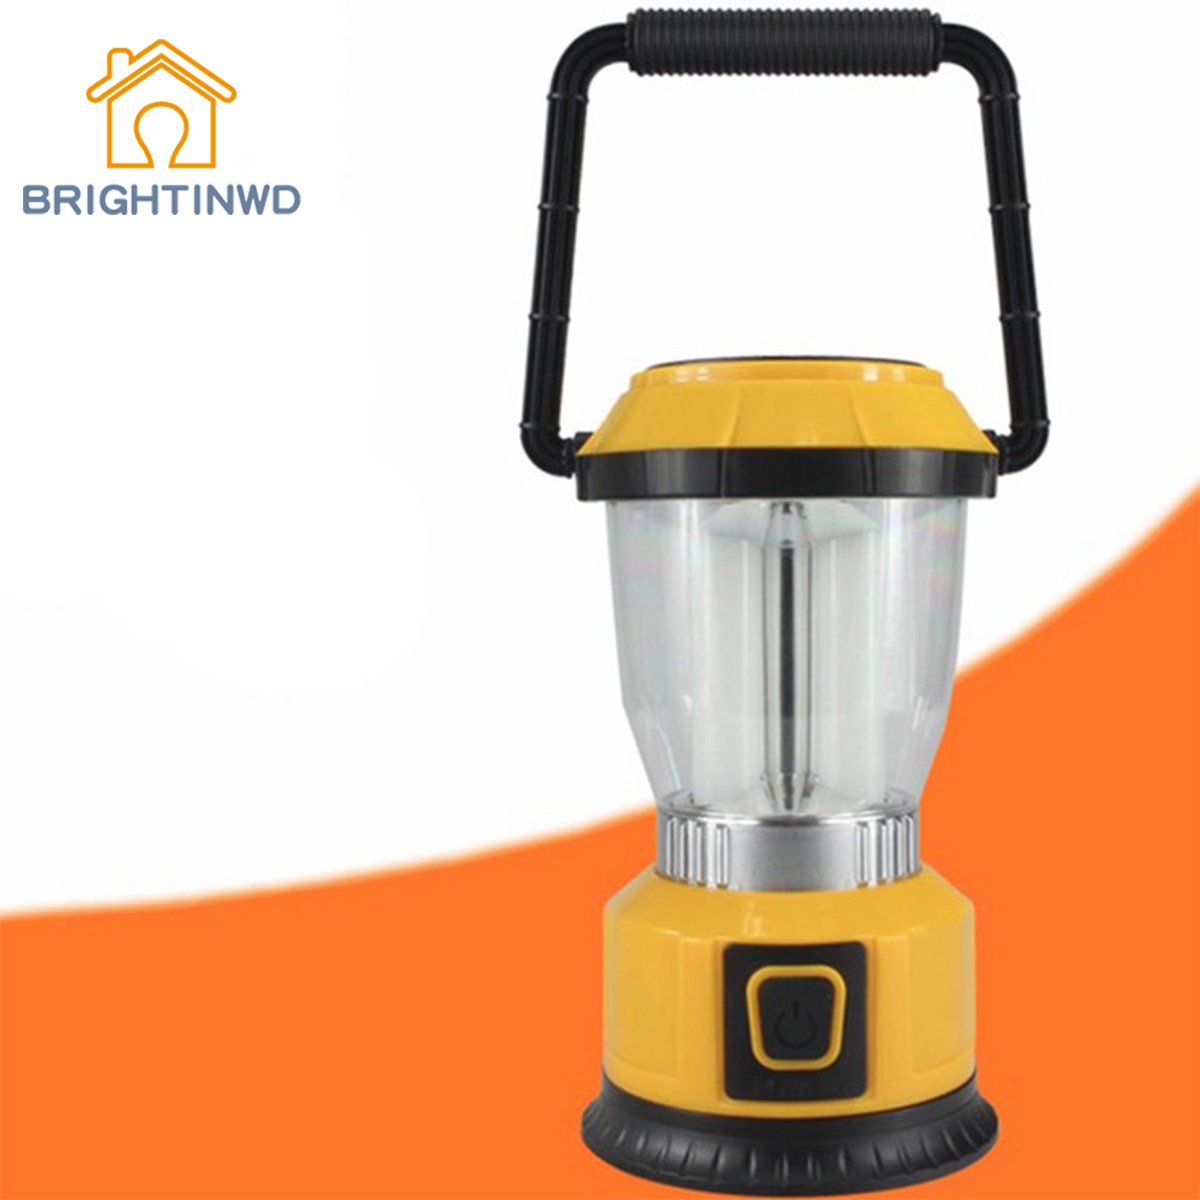 BRIGHTINWD LED Outdoor Camping Light Energy Saving Hiking Tent Lantern 30 Lumens Lanterns Use 3 AA batteries Portable Lanterns